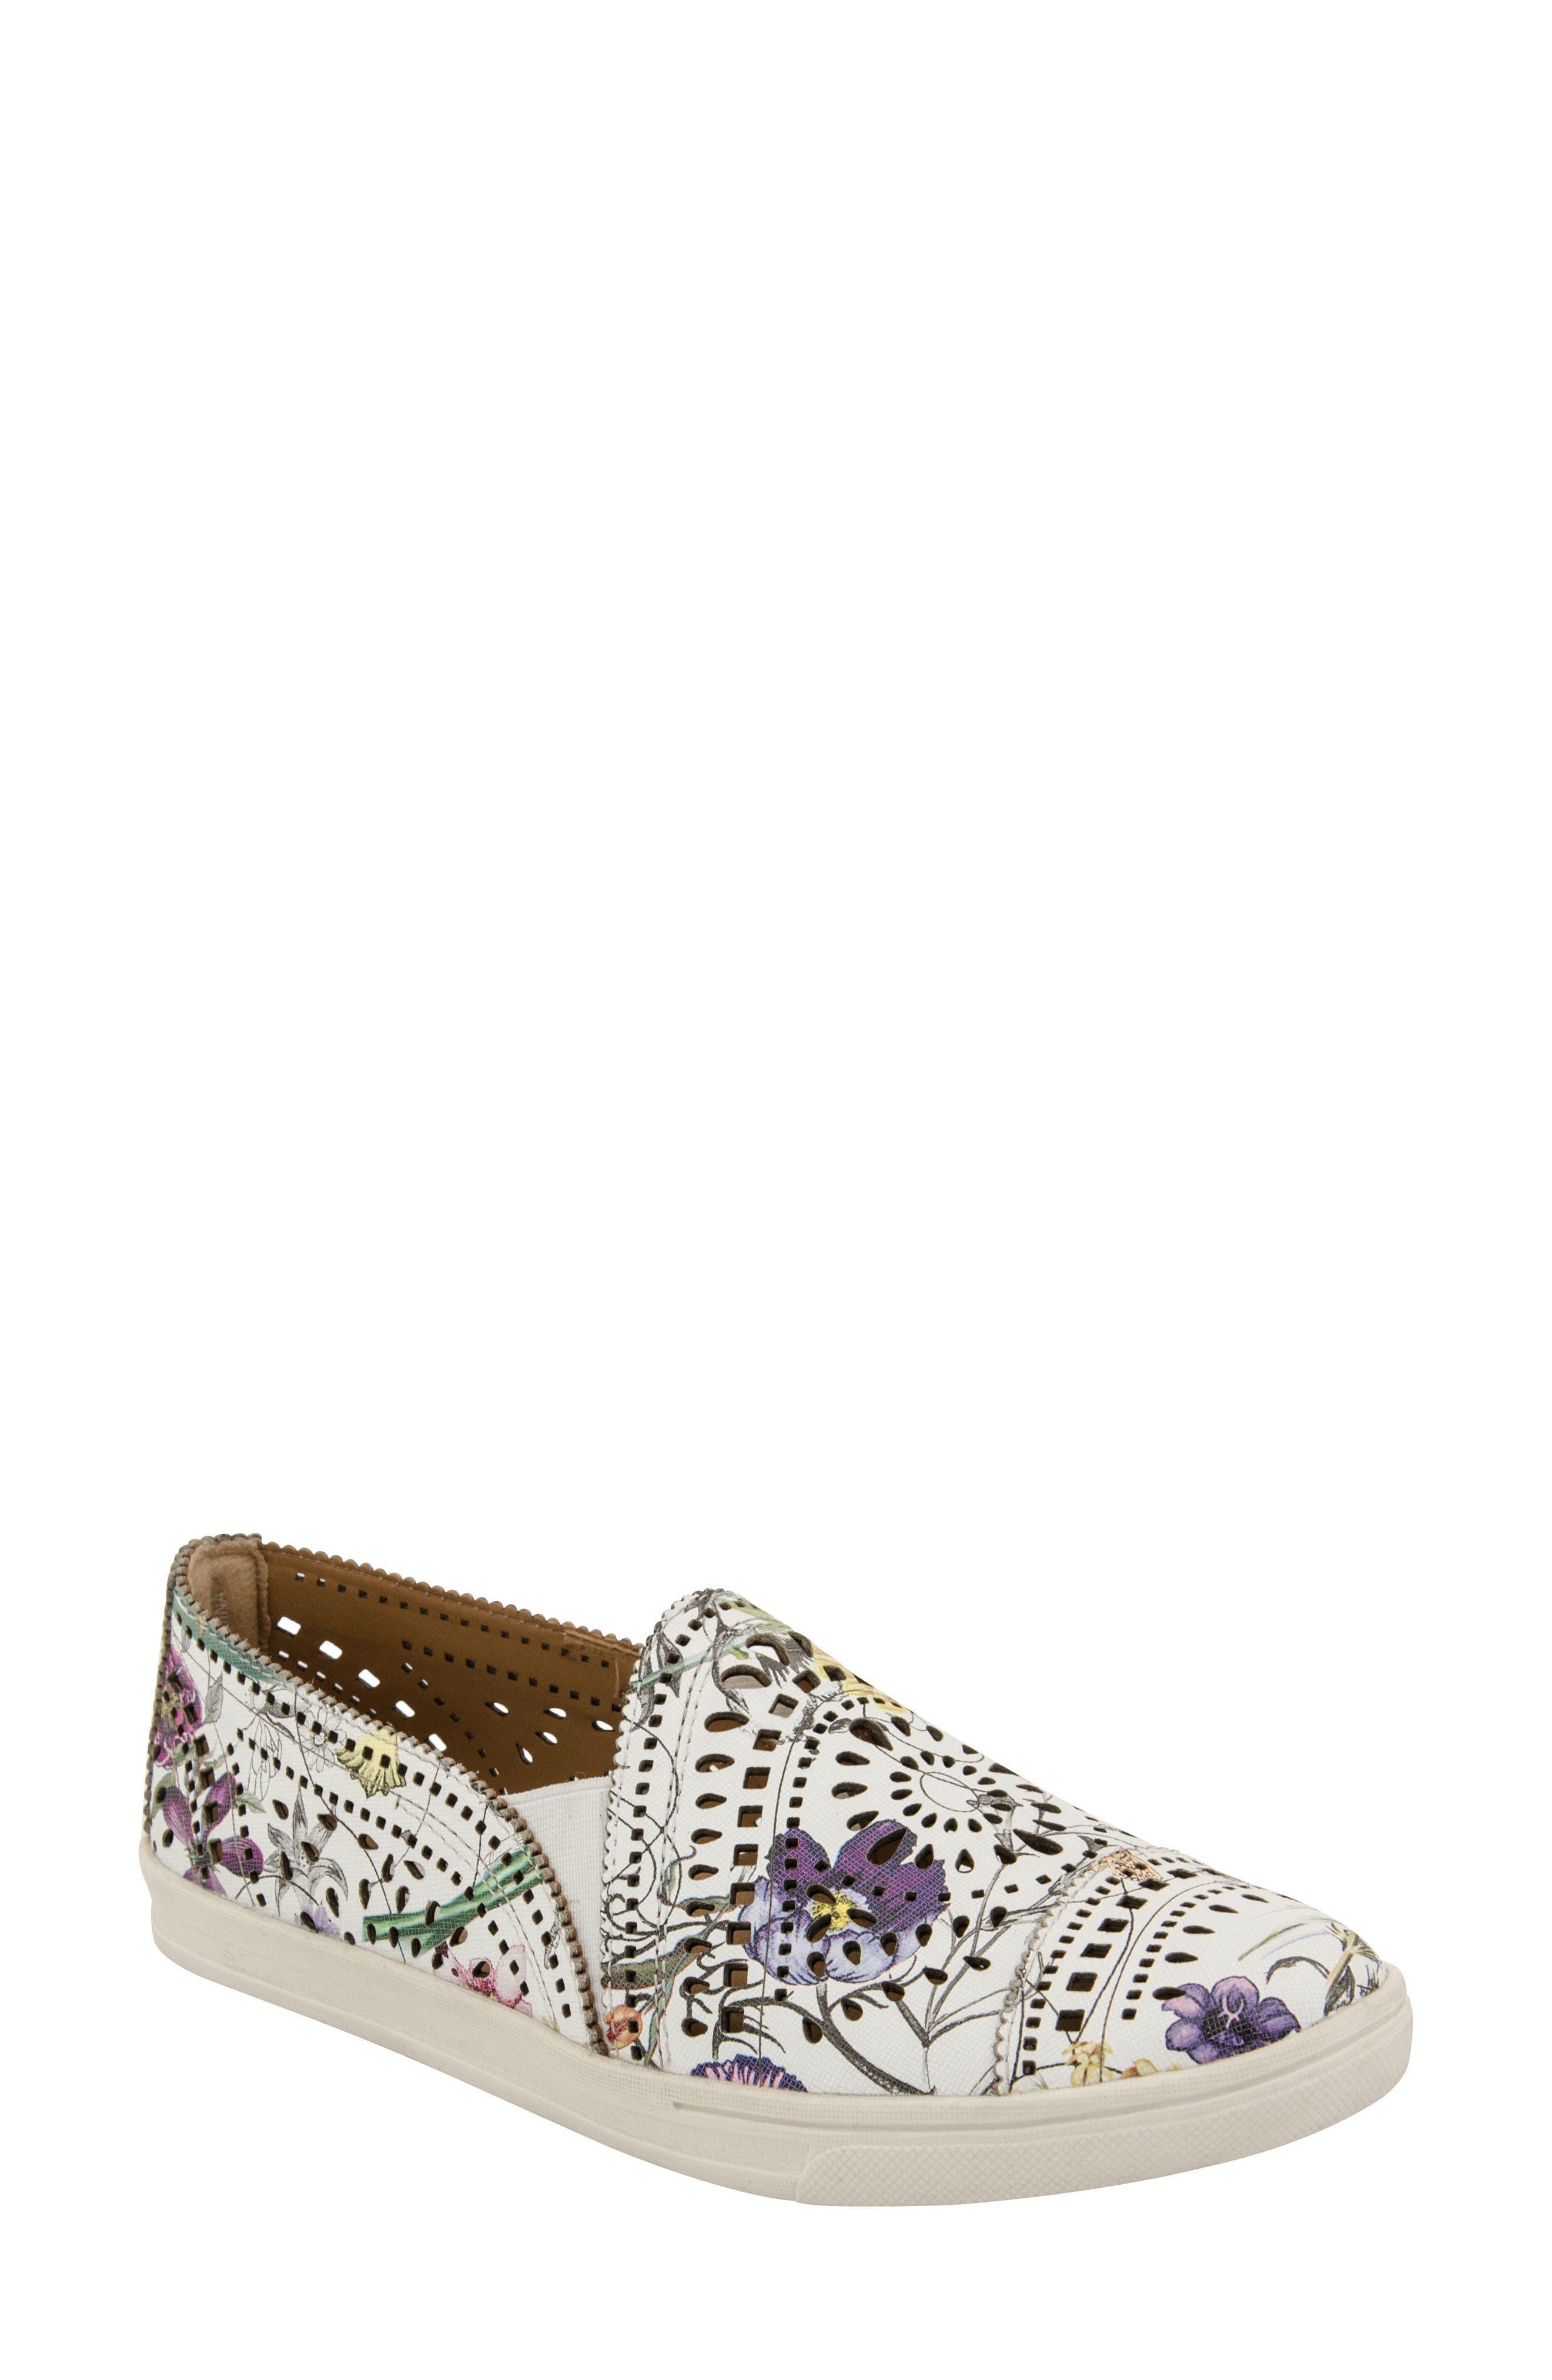 Main Image - Earth® 'Tangelo' Slip-On Sneaker (Women)